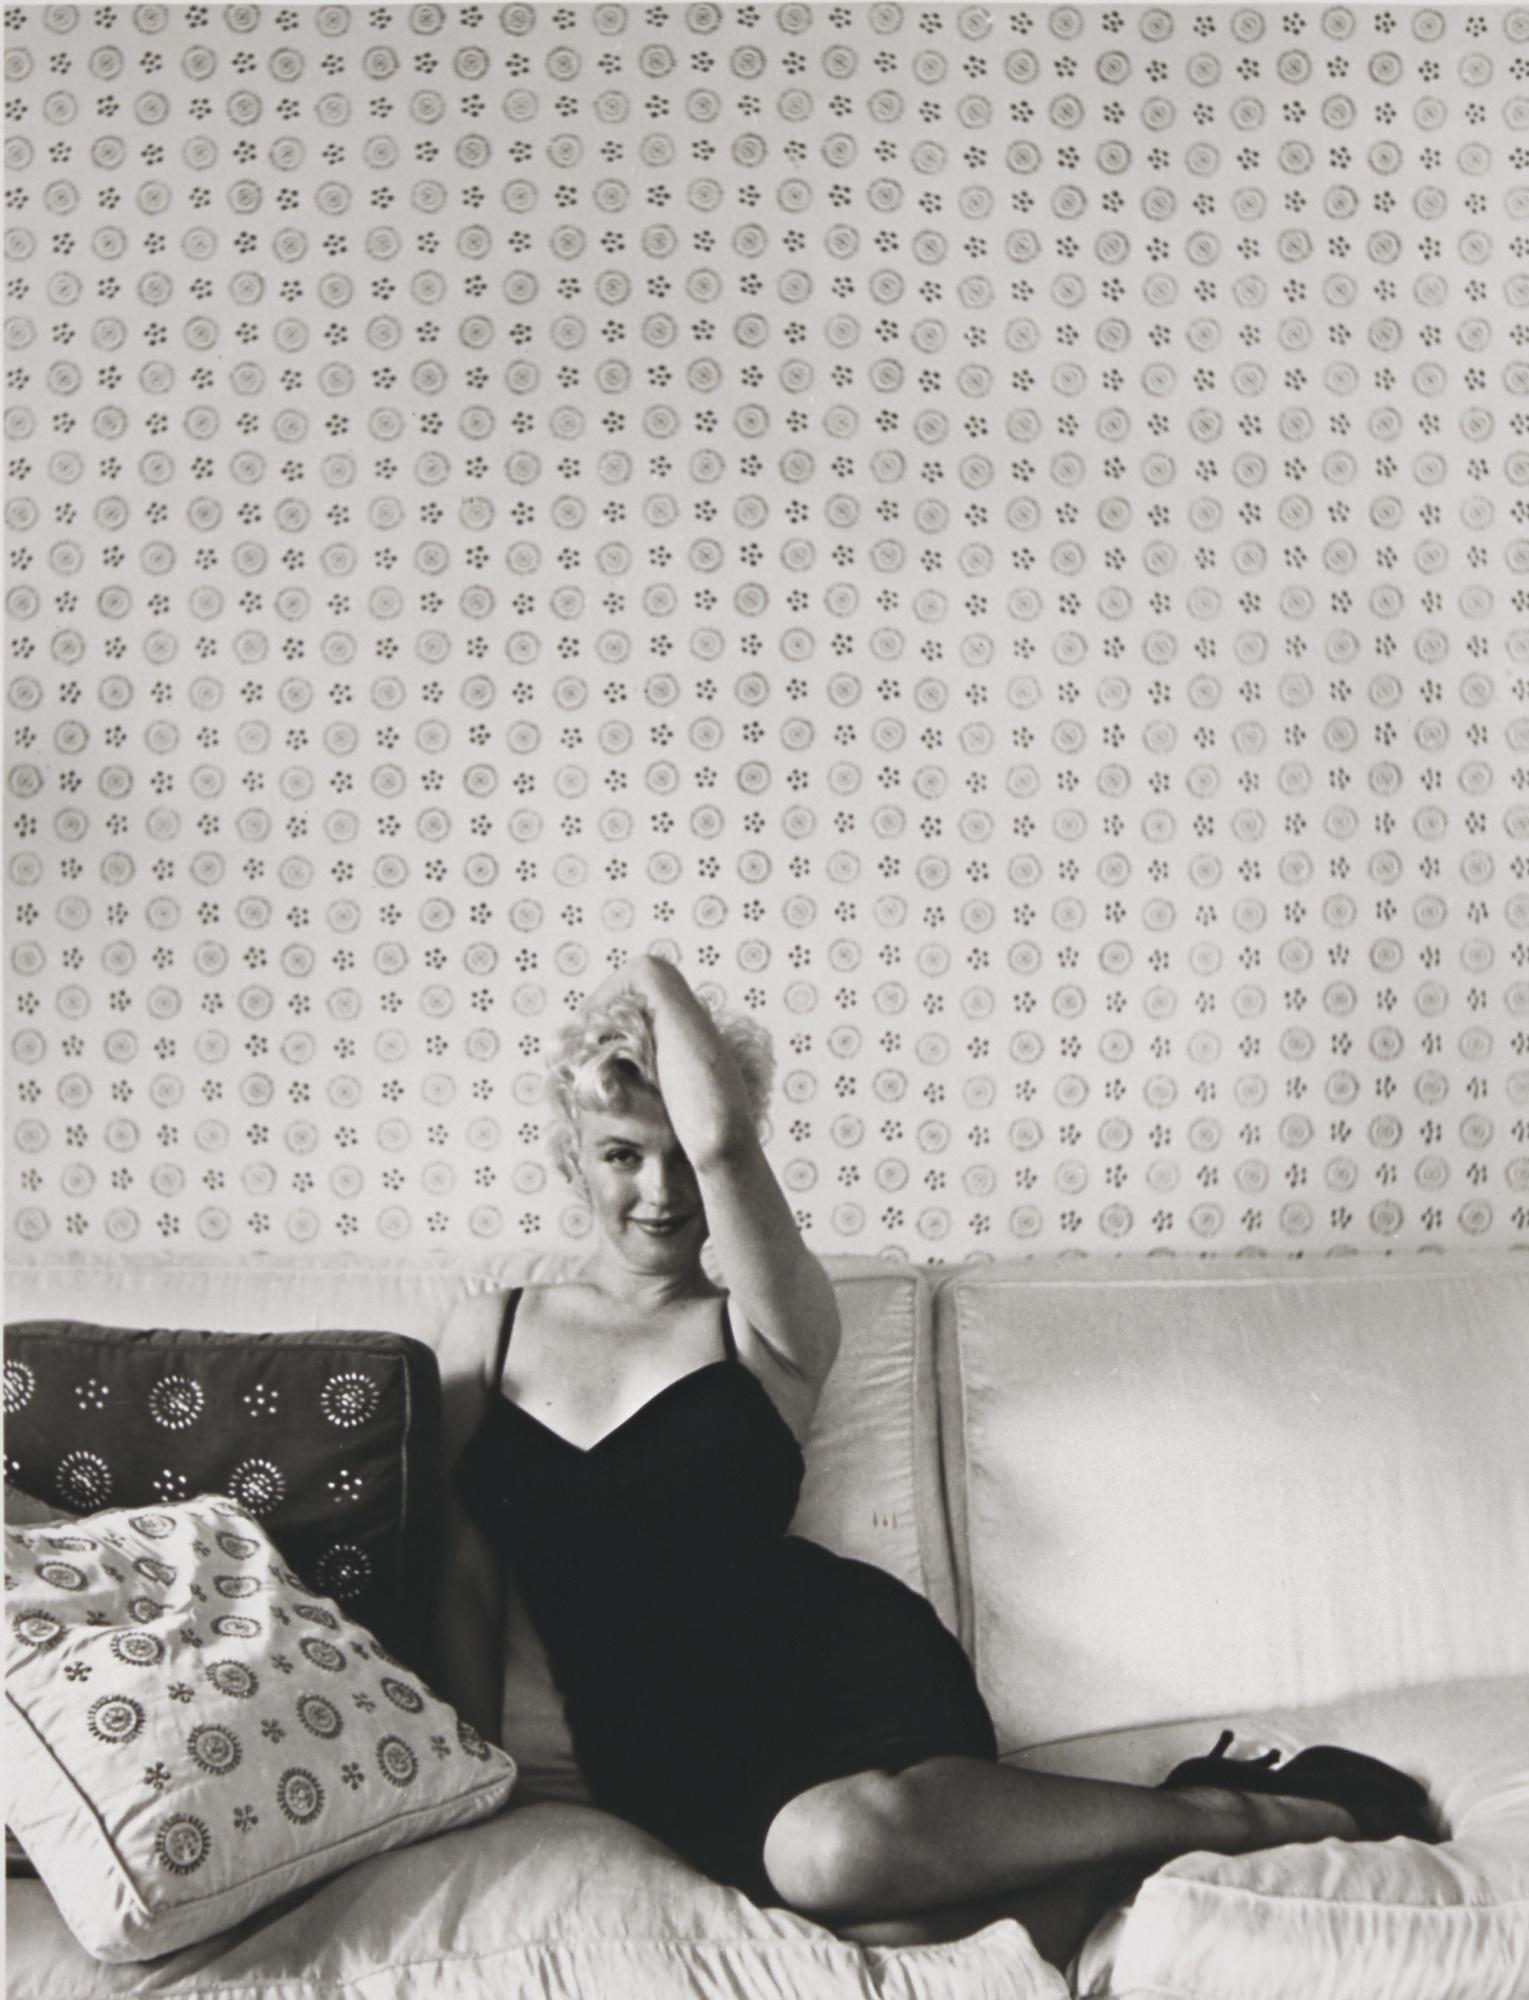 Cecil Beaton-Marilyn Monroe 1956-